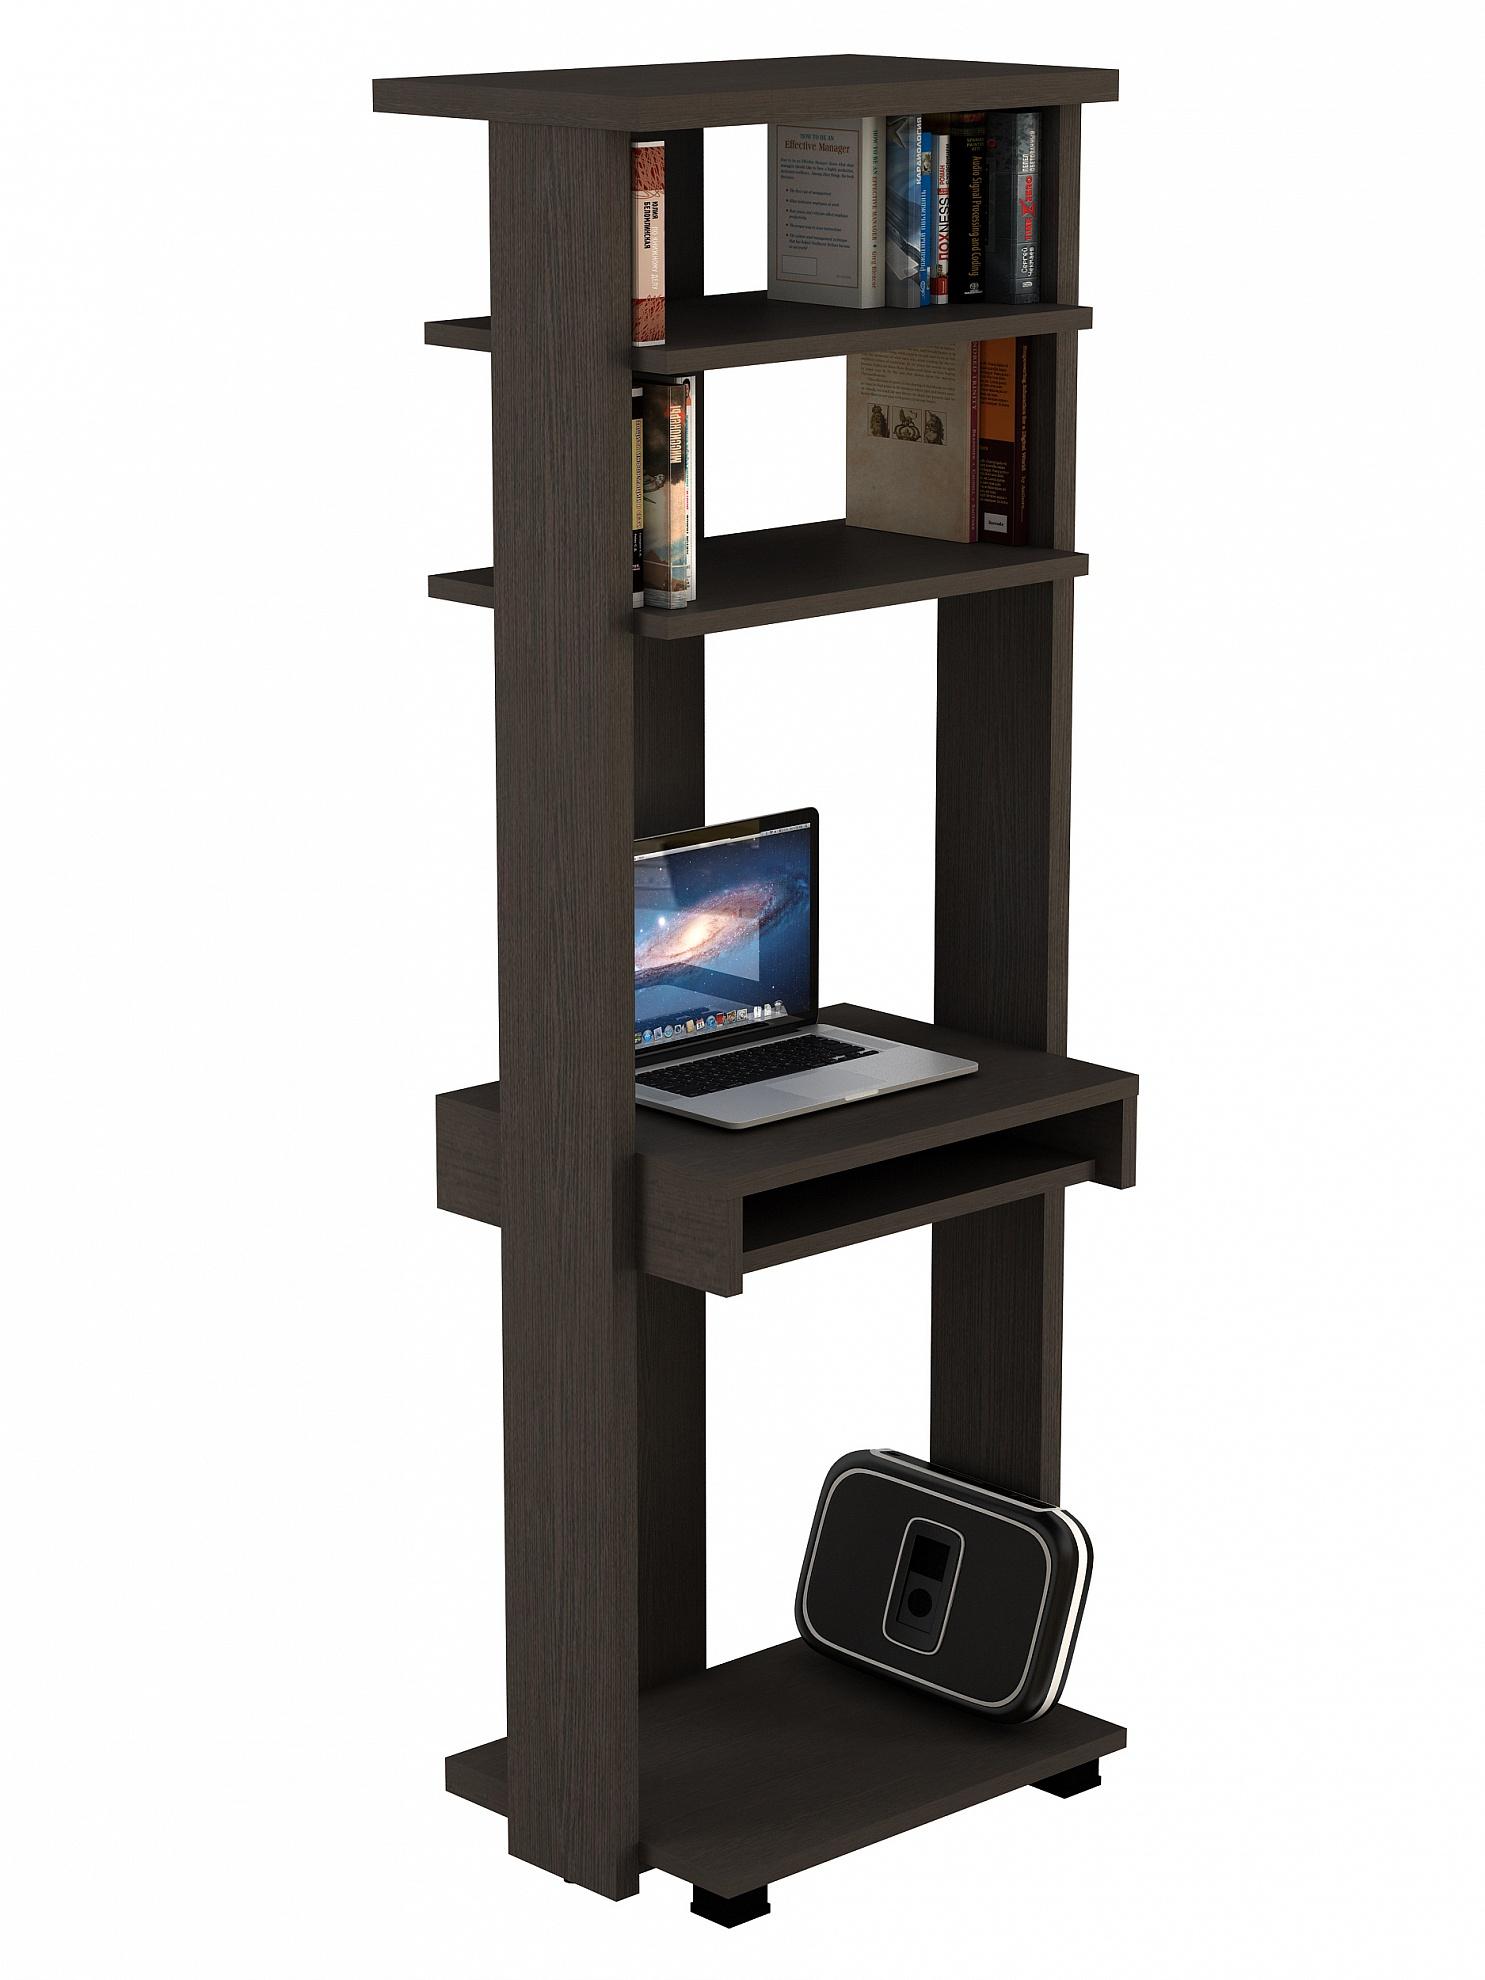 Компьютерный стол КС 20-38 компьютерный стол кс 20 16м3